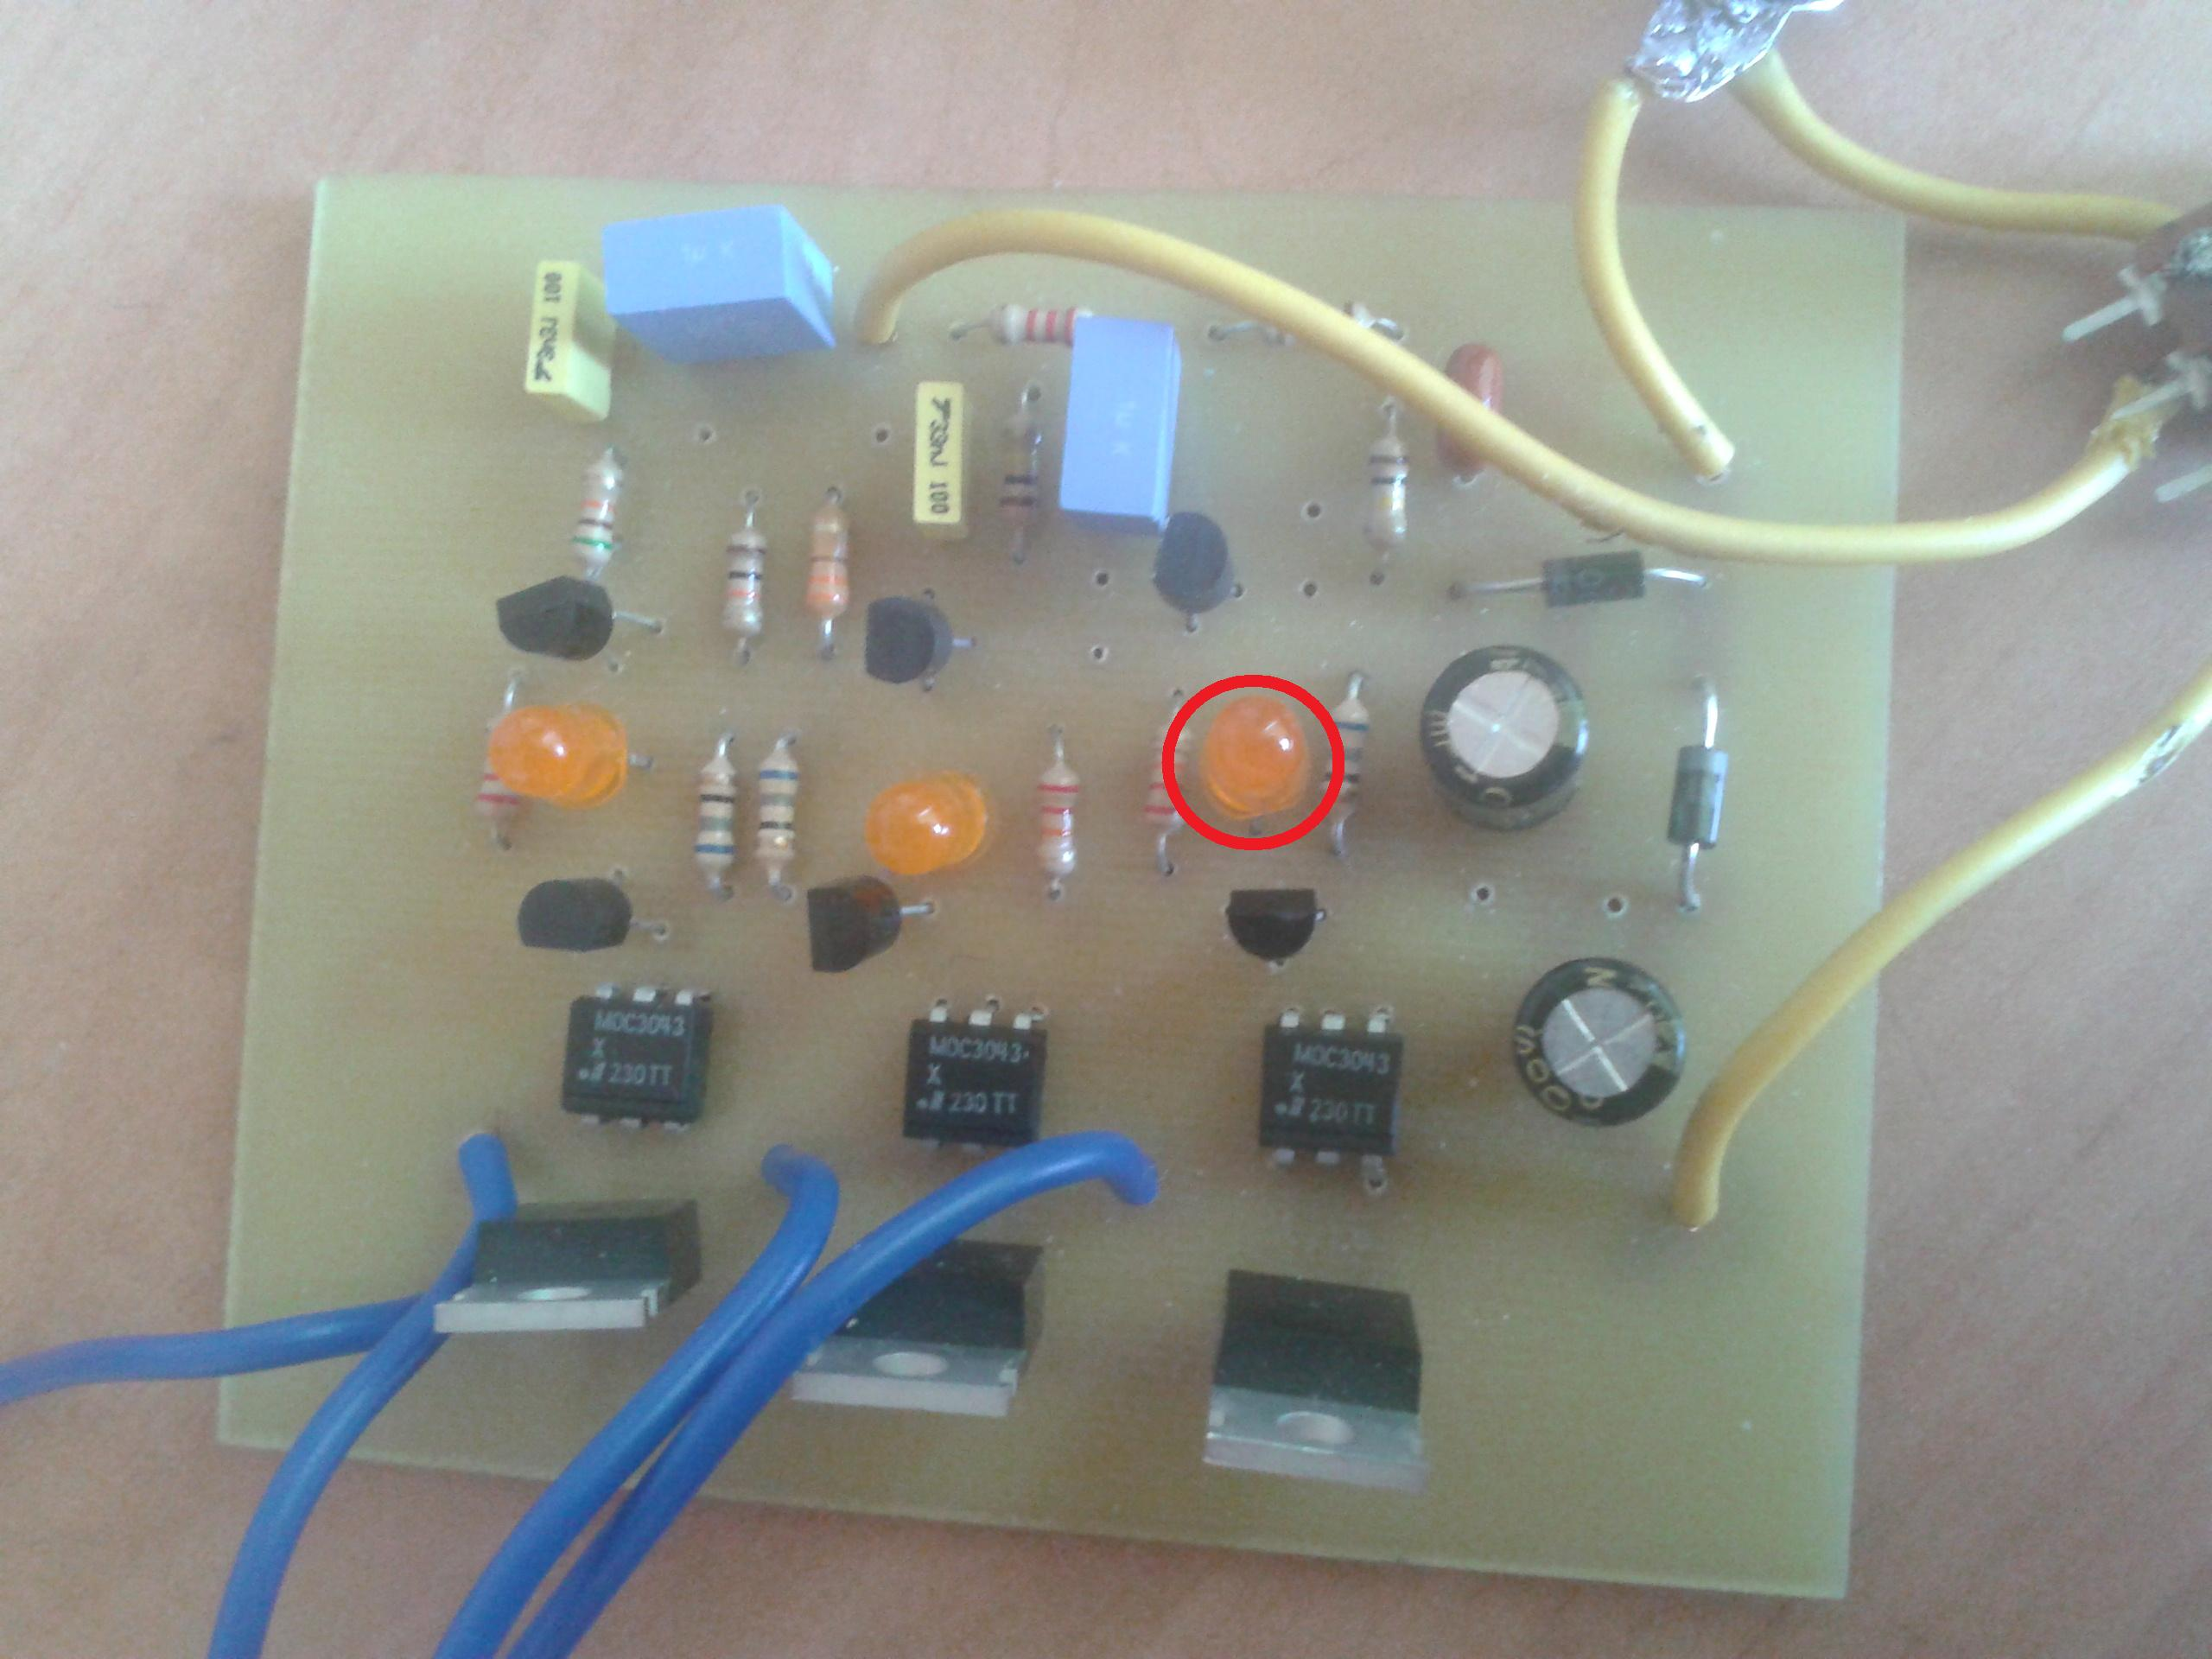 AVT2195 - niedzialajacy uklad iluminofonii (kolorofon) AVT2195